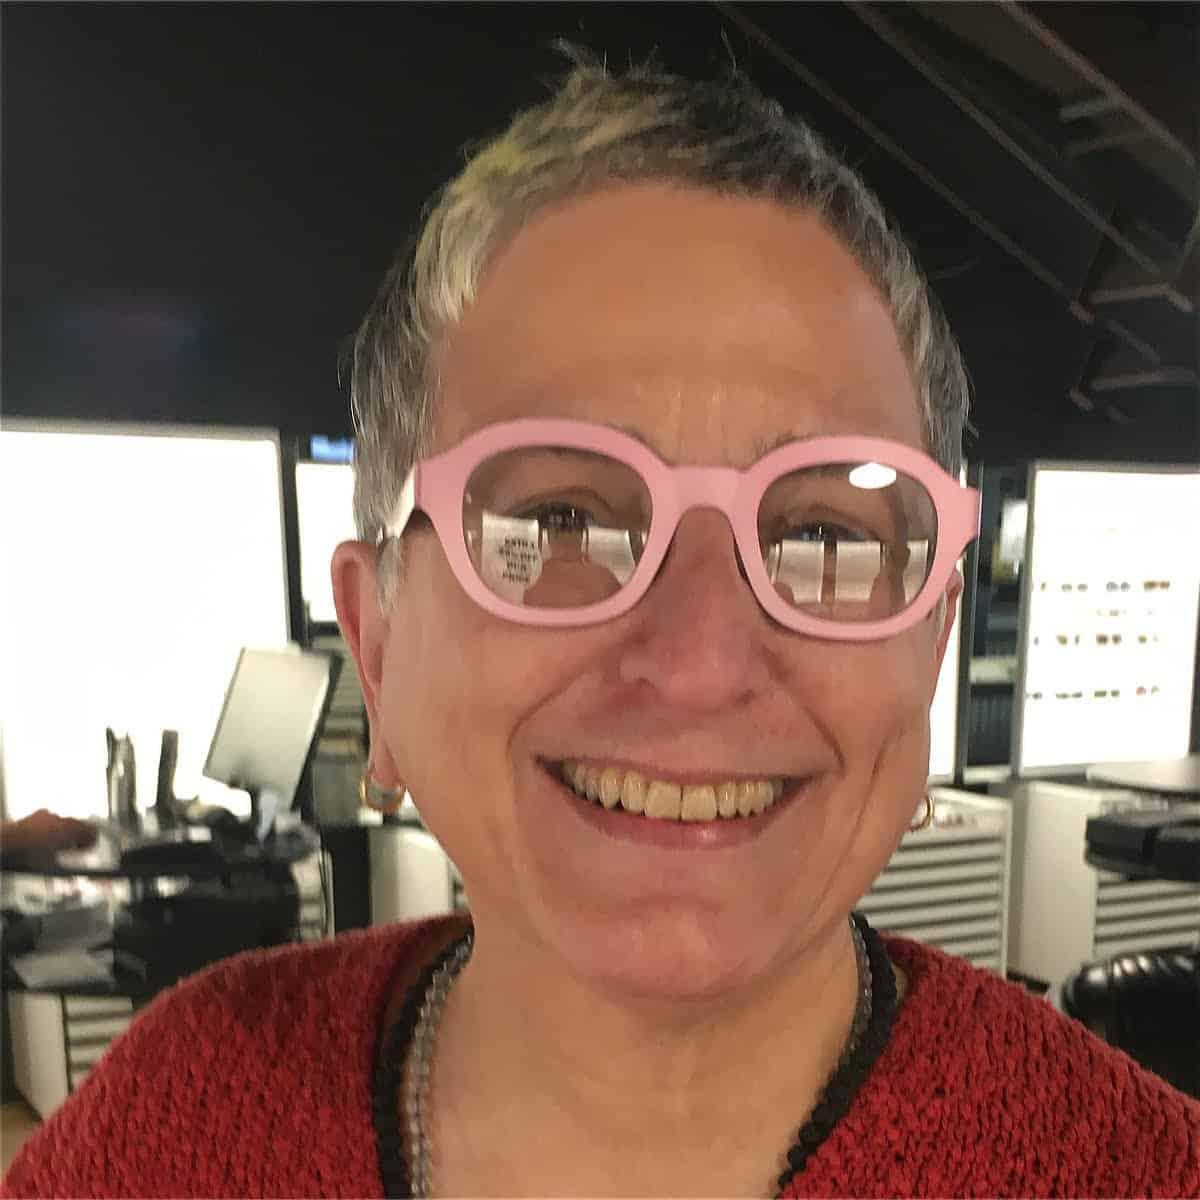 Shambhavi in pink glasses